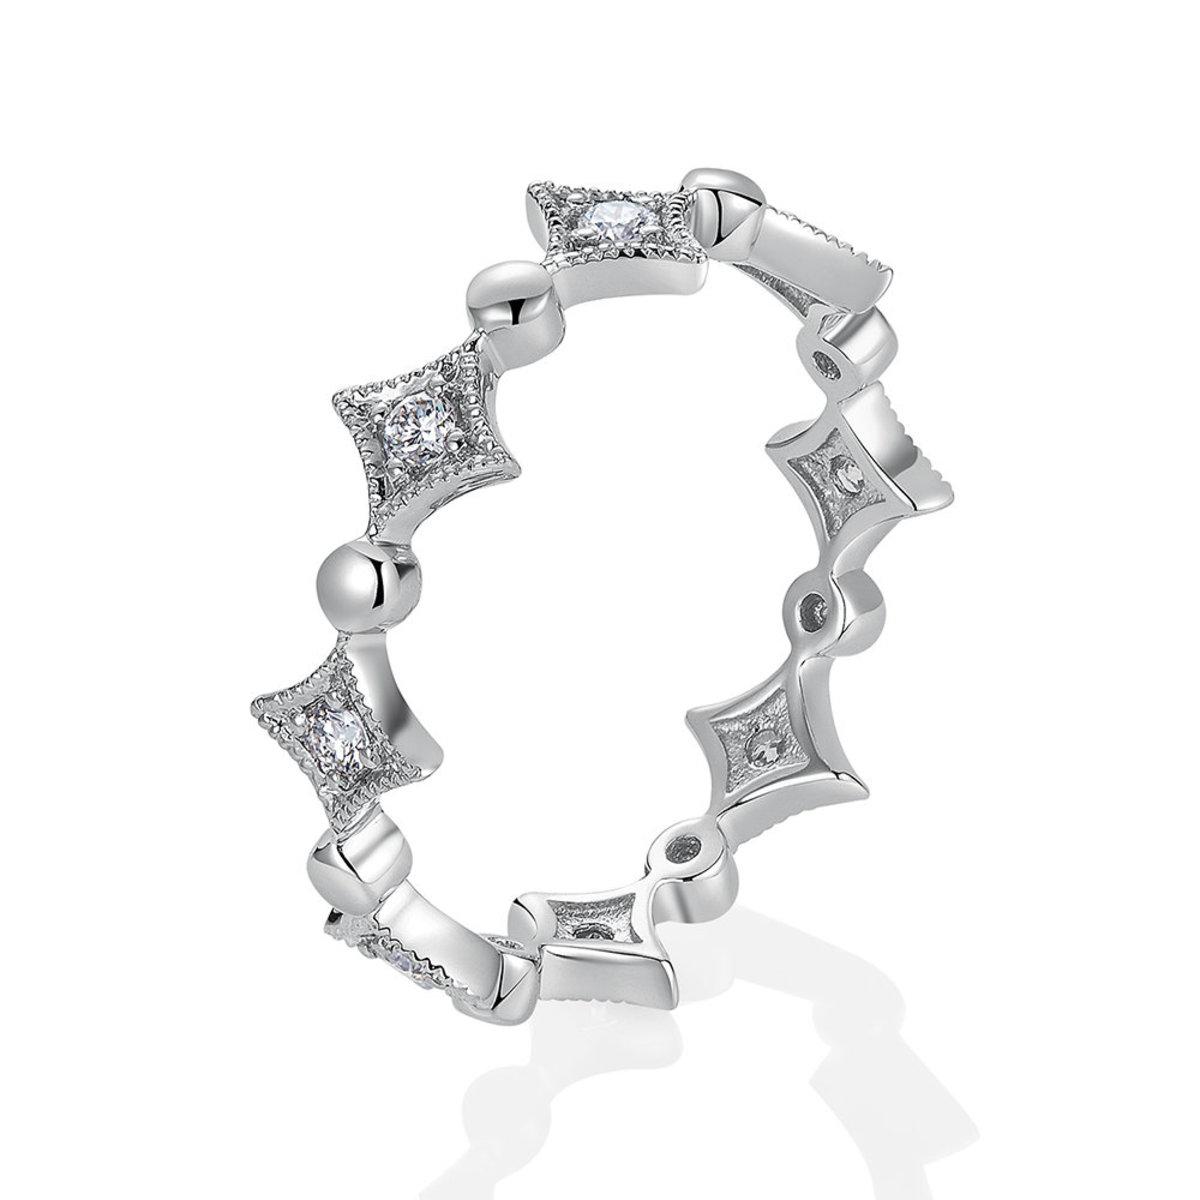 18K White Gold Diamond Ring (0.18 ct. tw.)